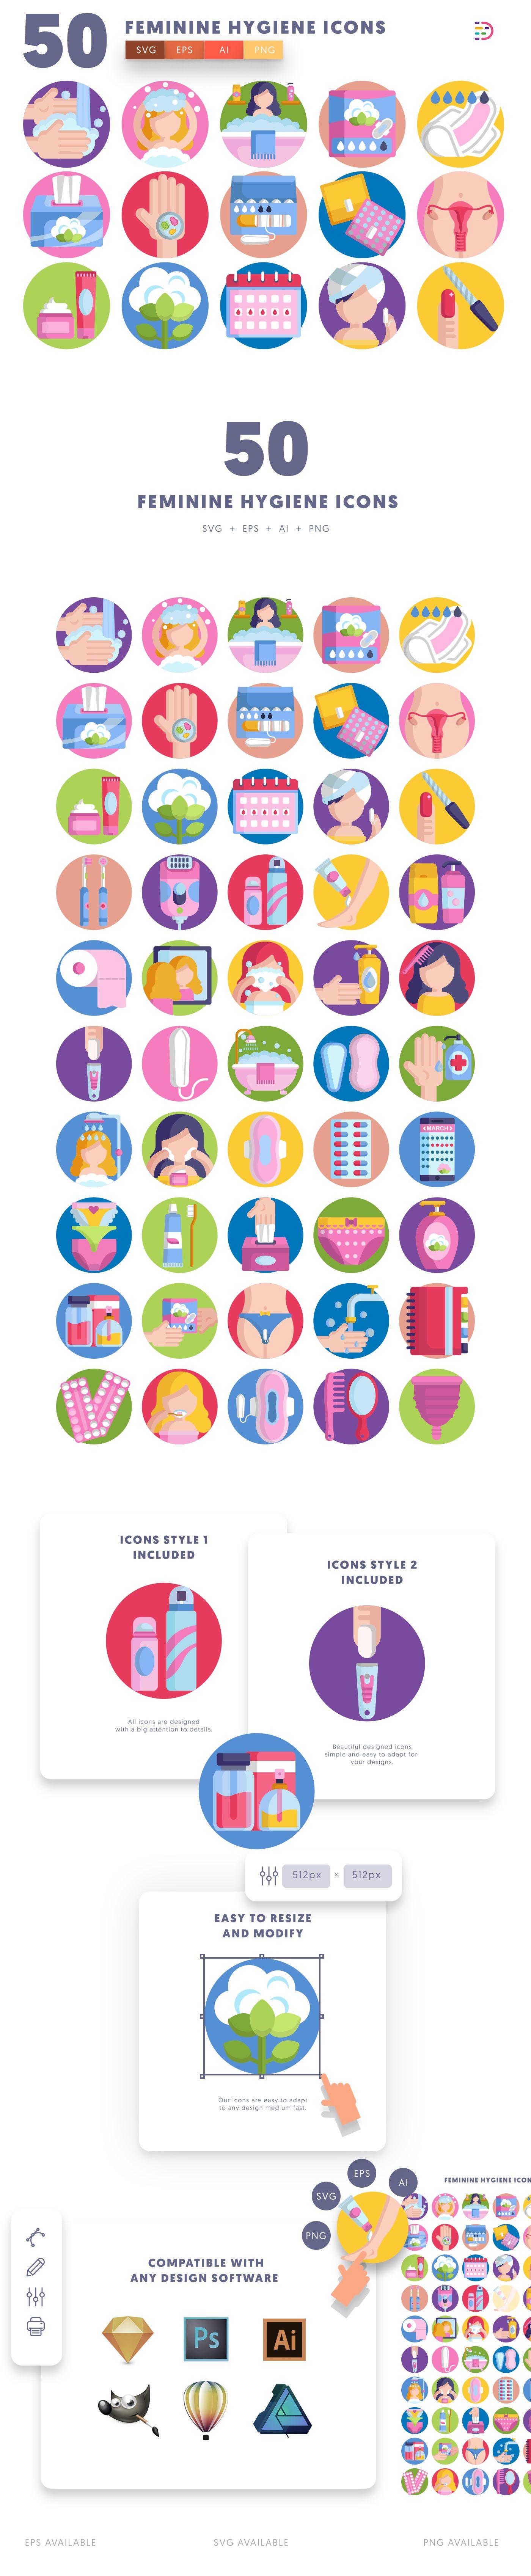 Feminine Hygiene icons info graphic